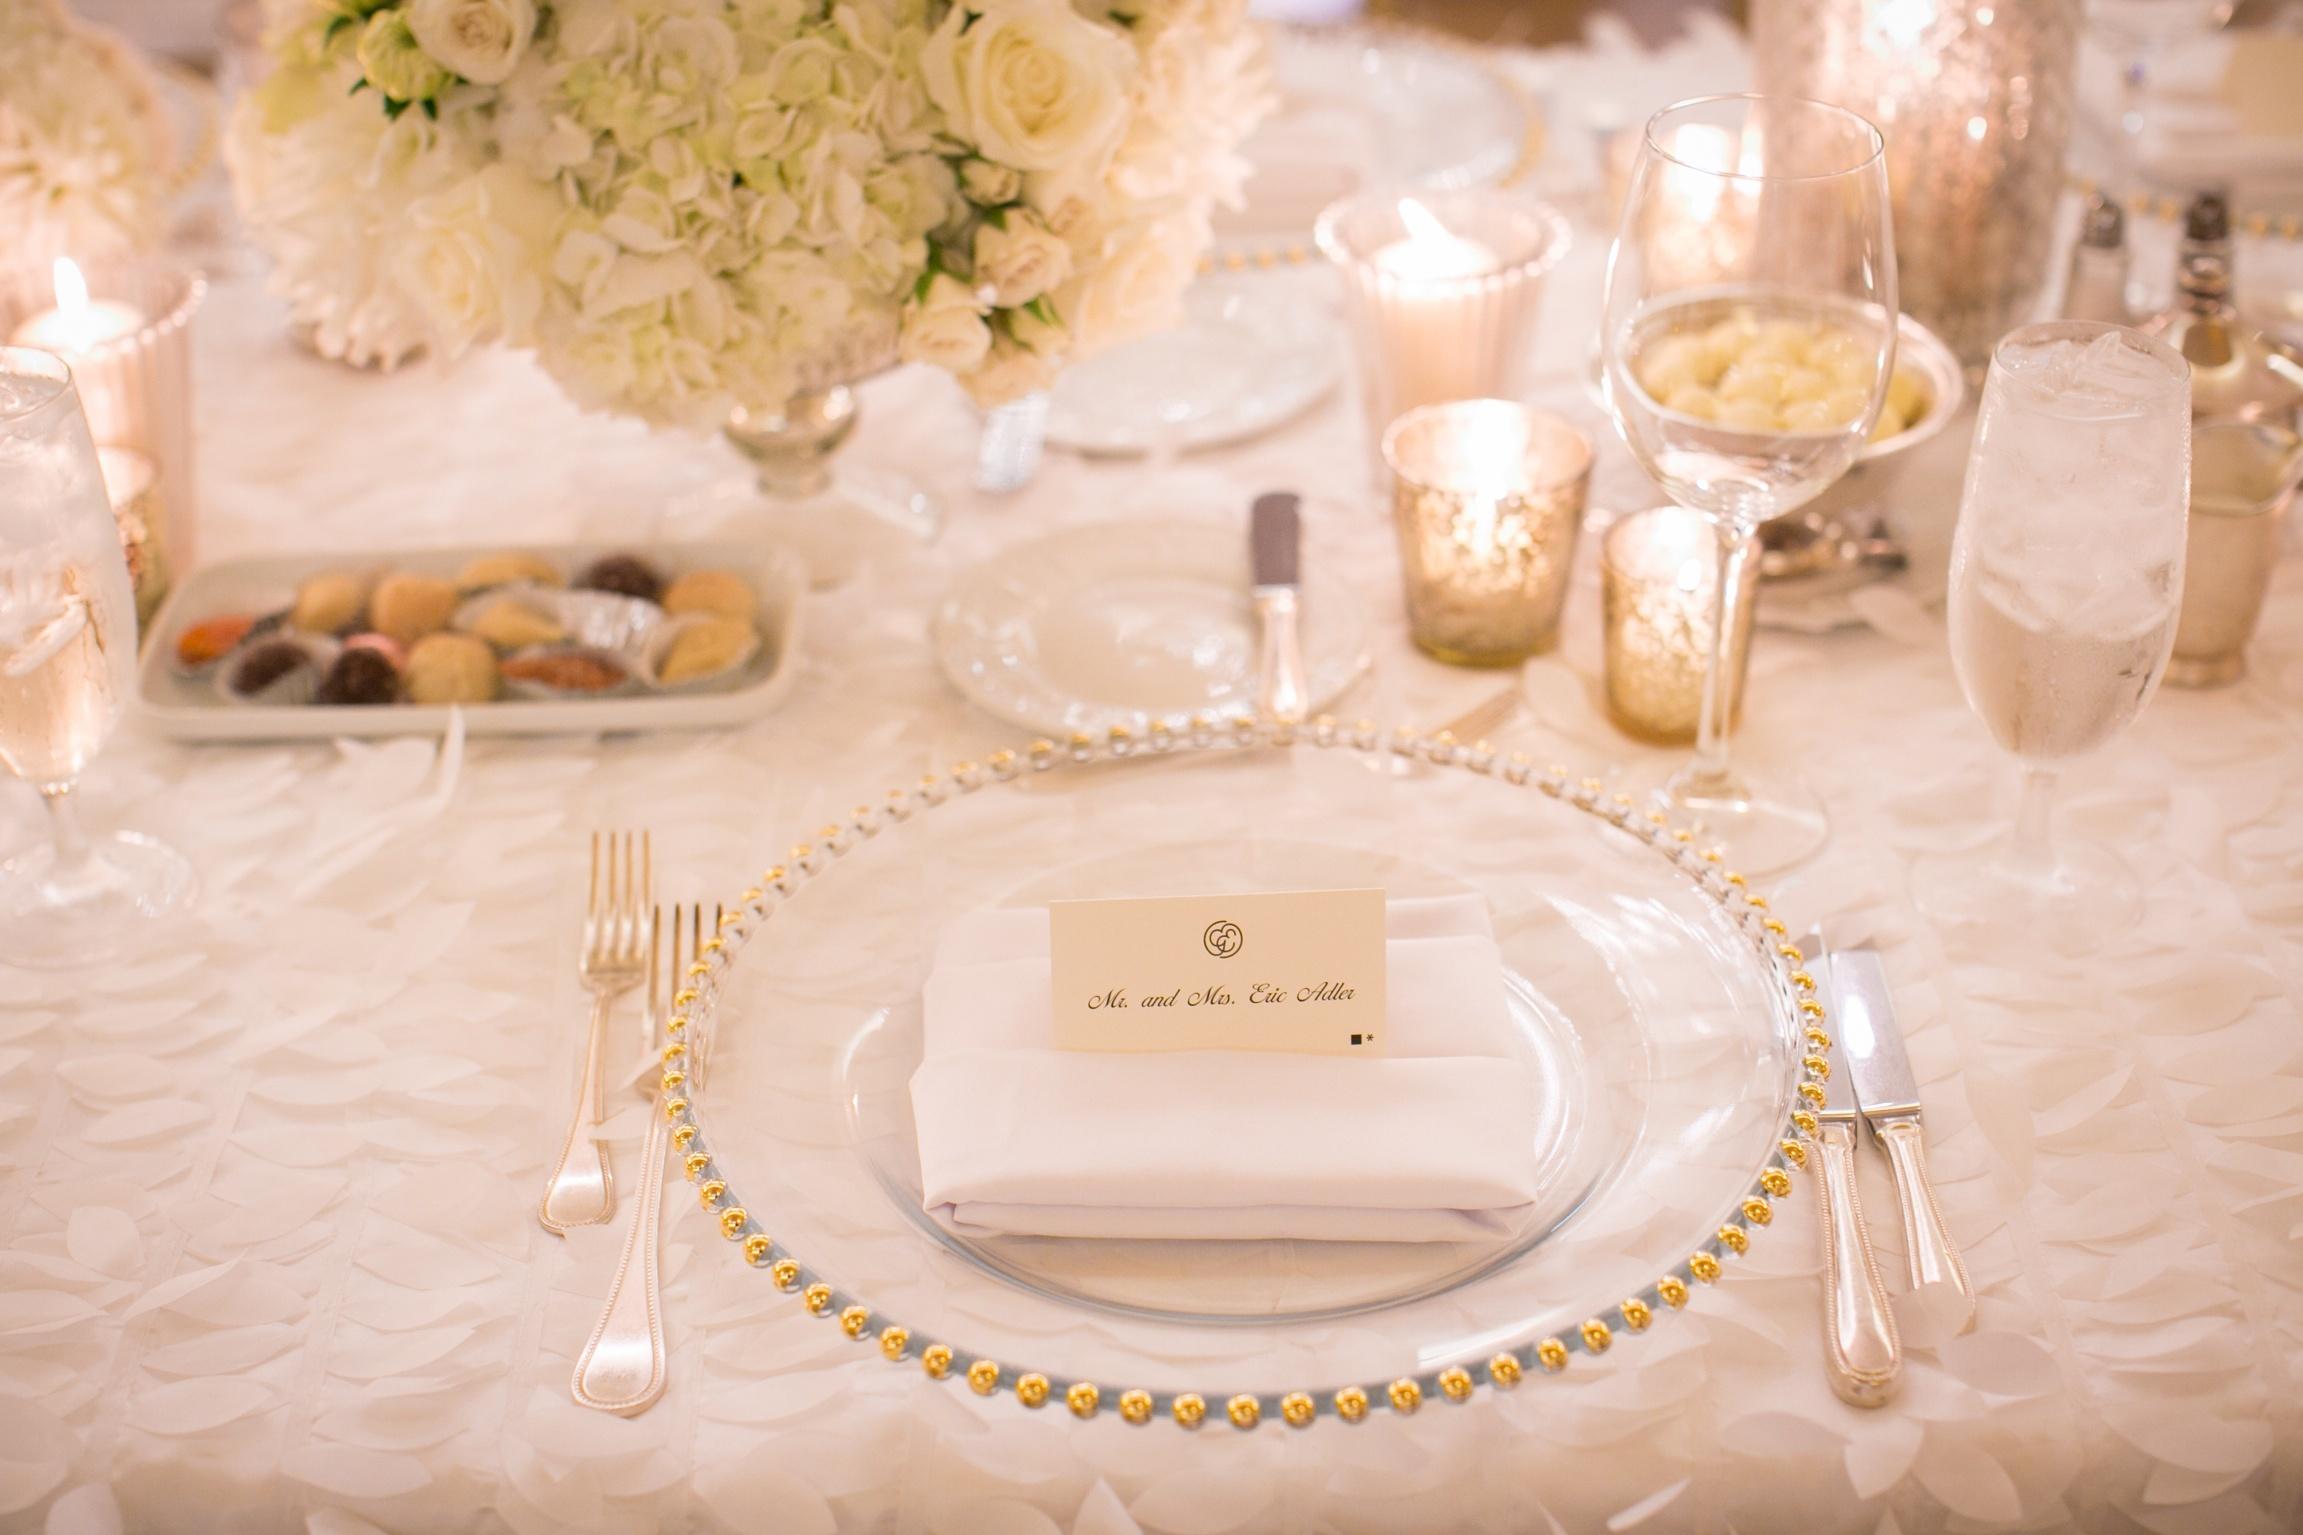 Classic Romantic Wedding Theme - Ballroom Table Setting (1)